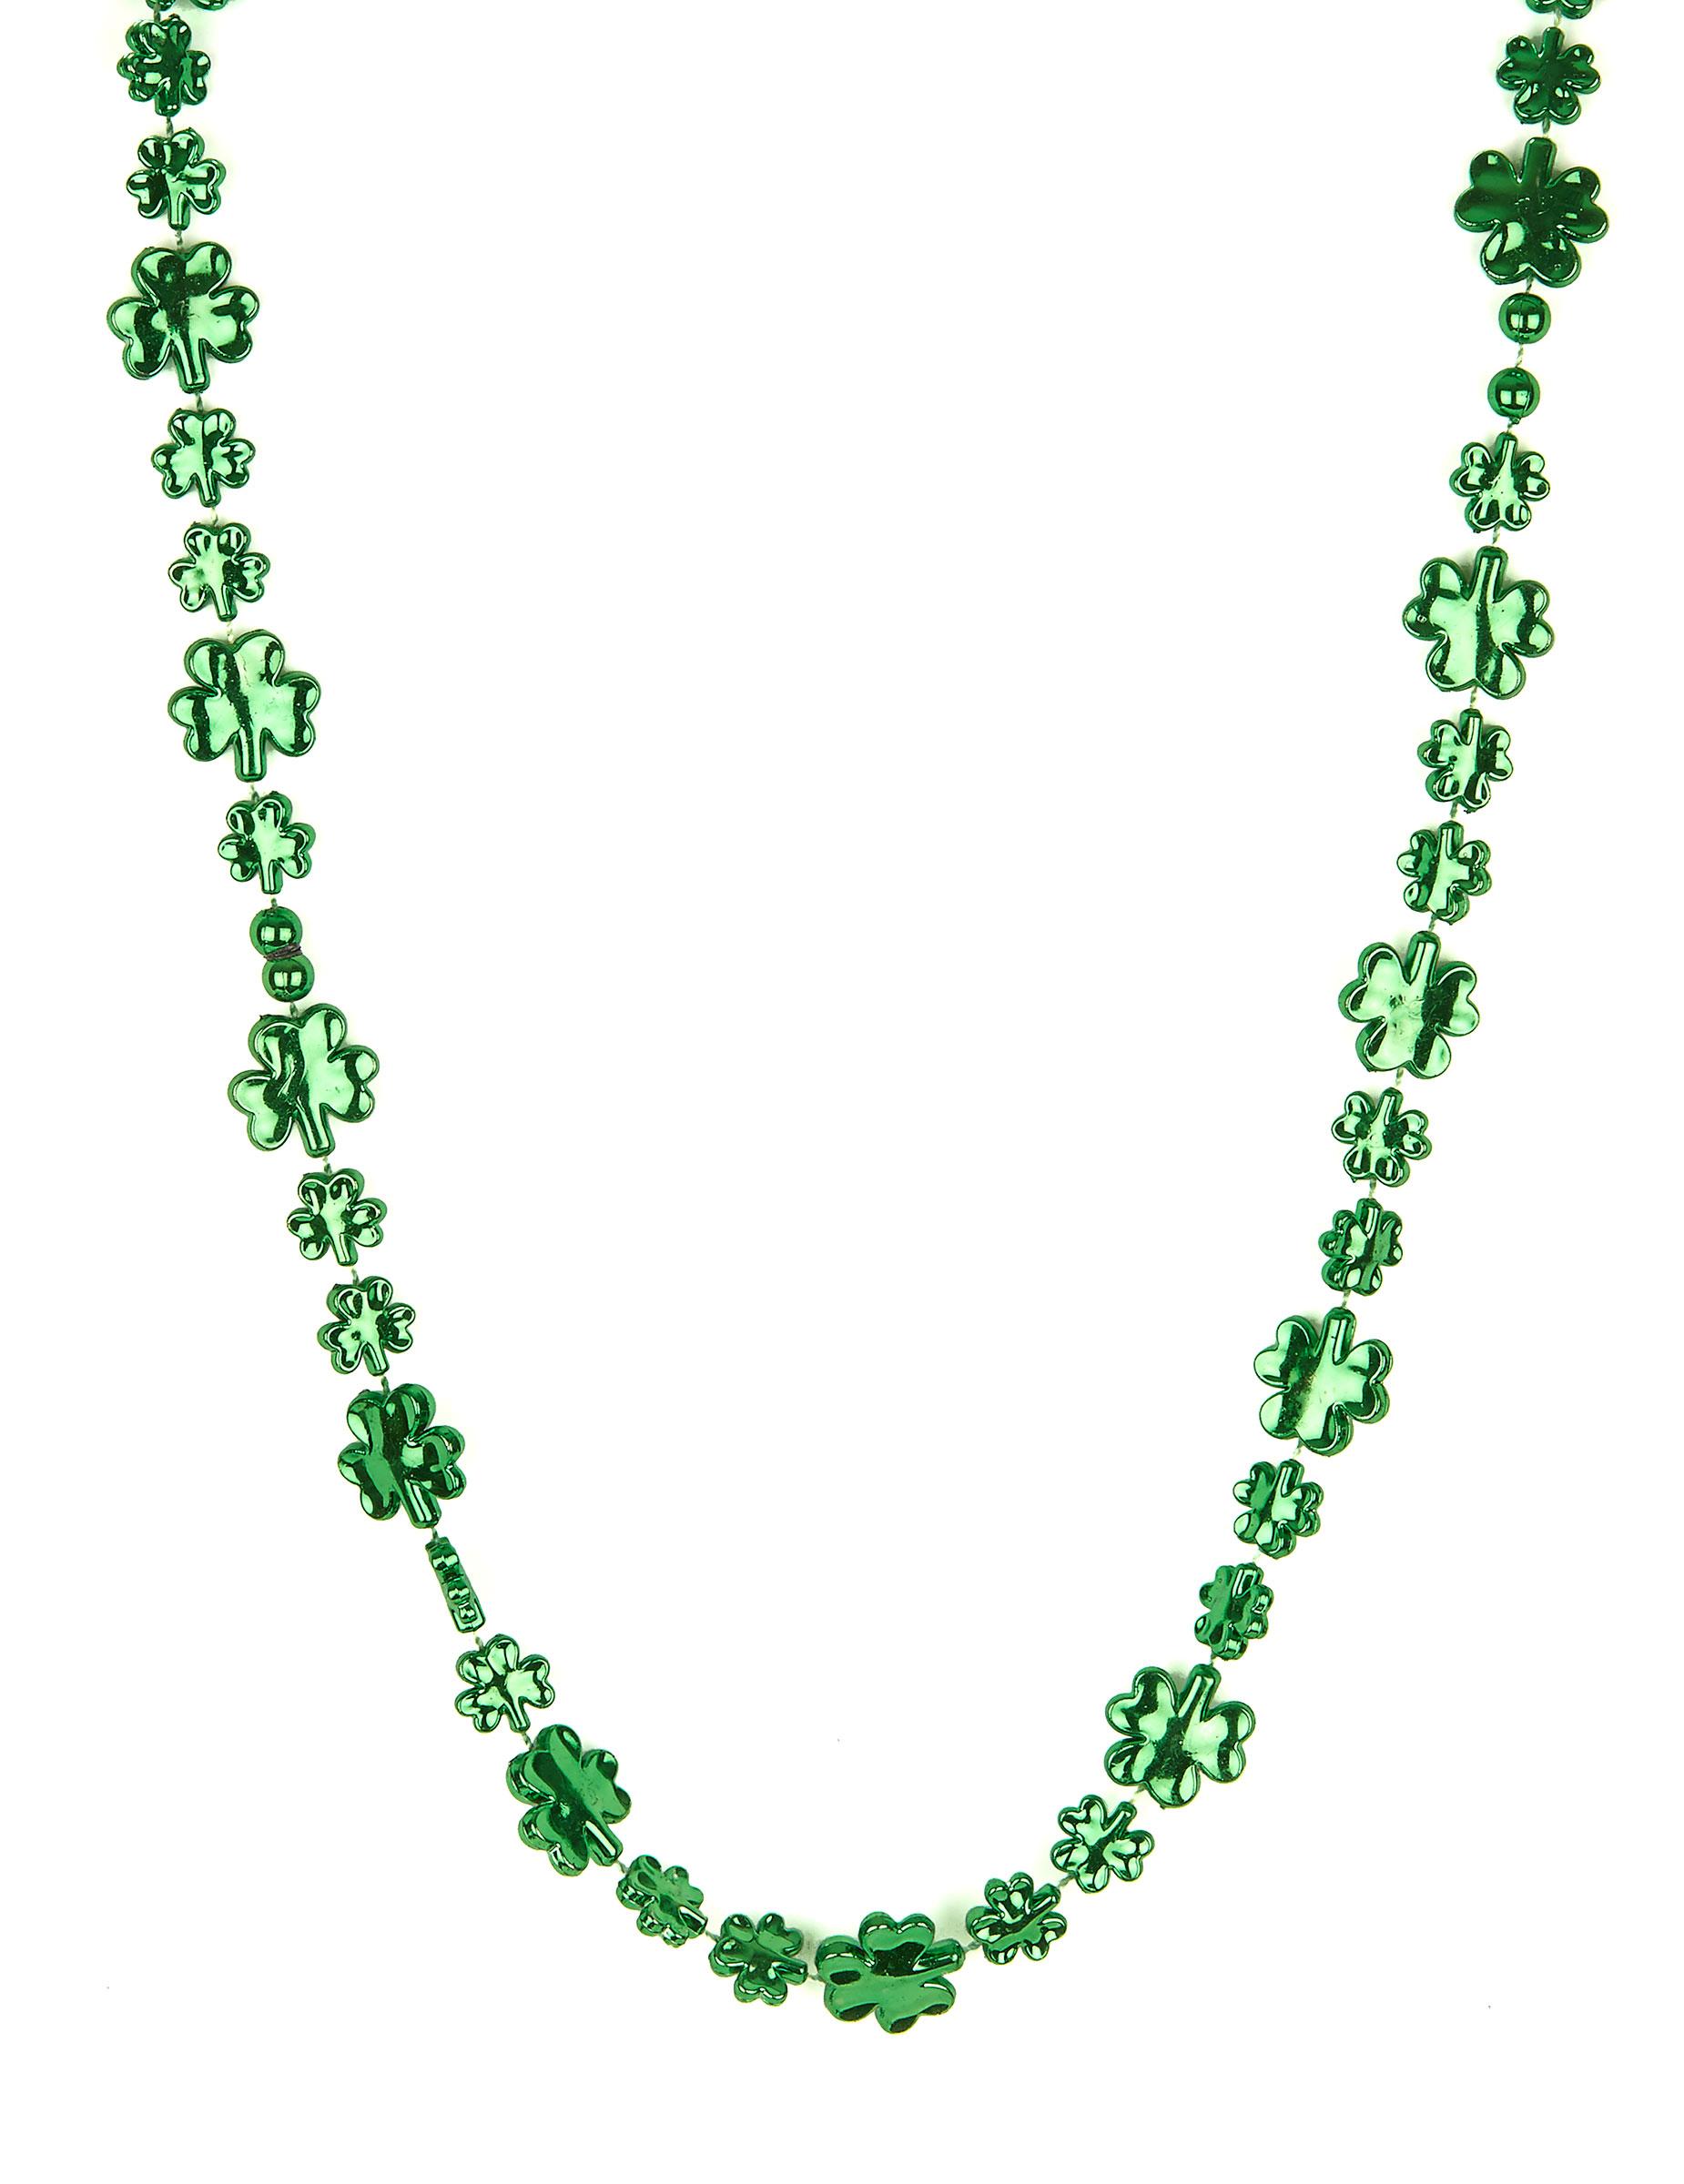 *Kleeblatt Halskette St. Patrick's Day grün*